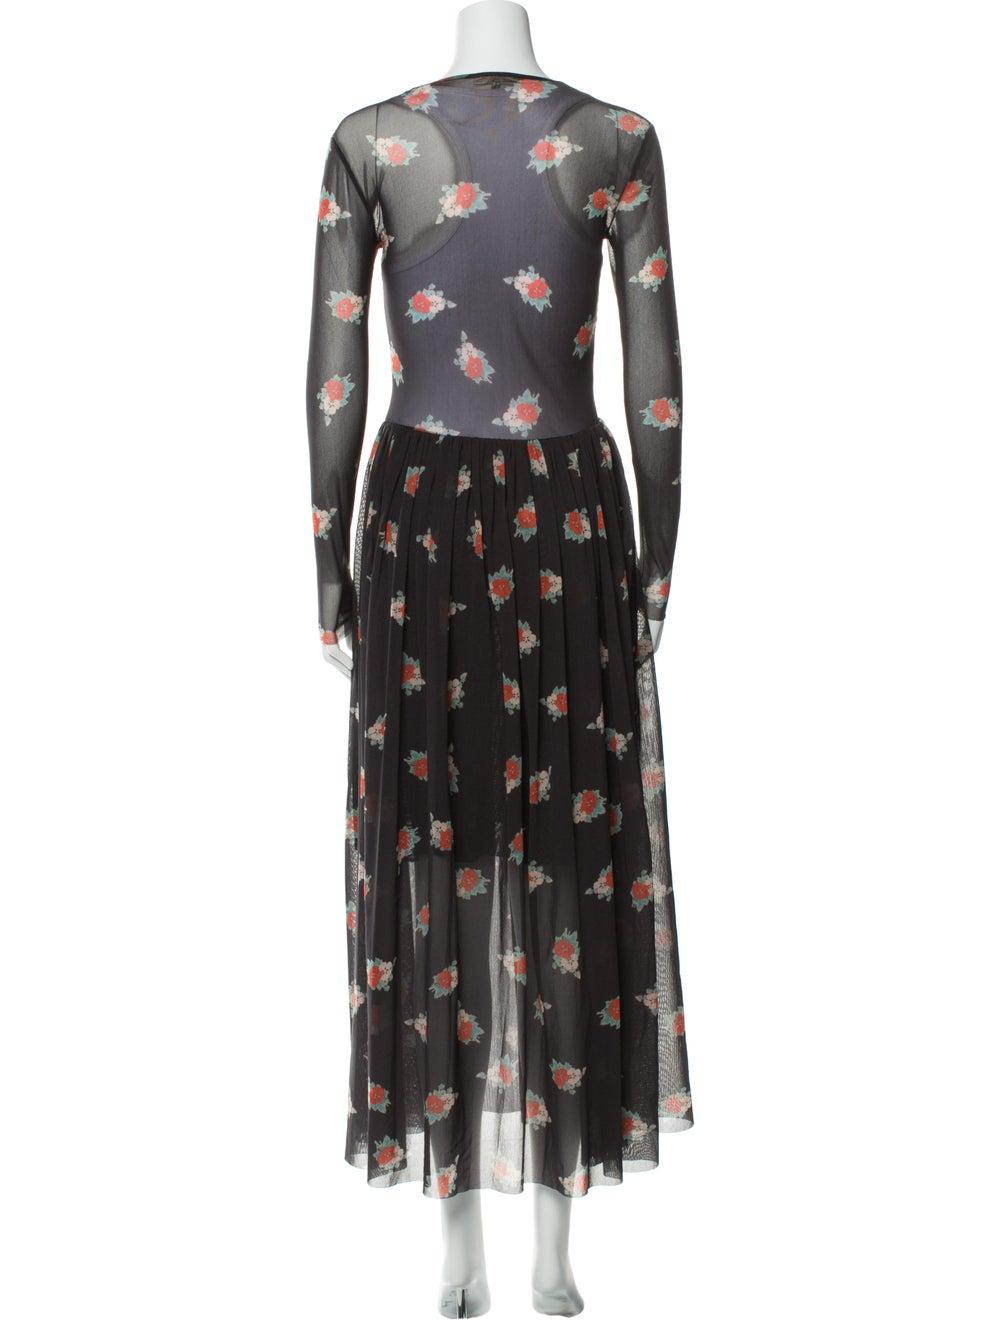 Ganni Floral Print Long Dress Grey - image 3